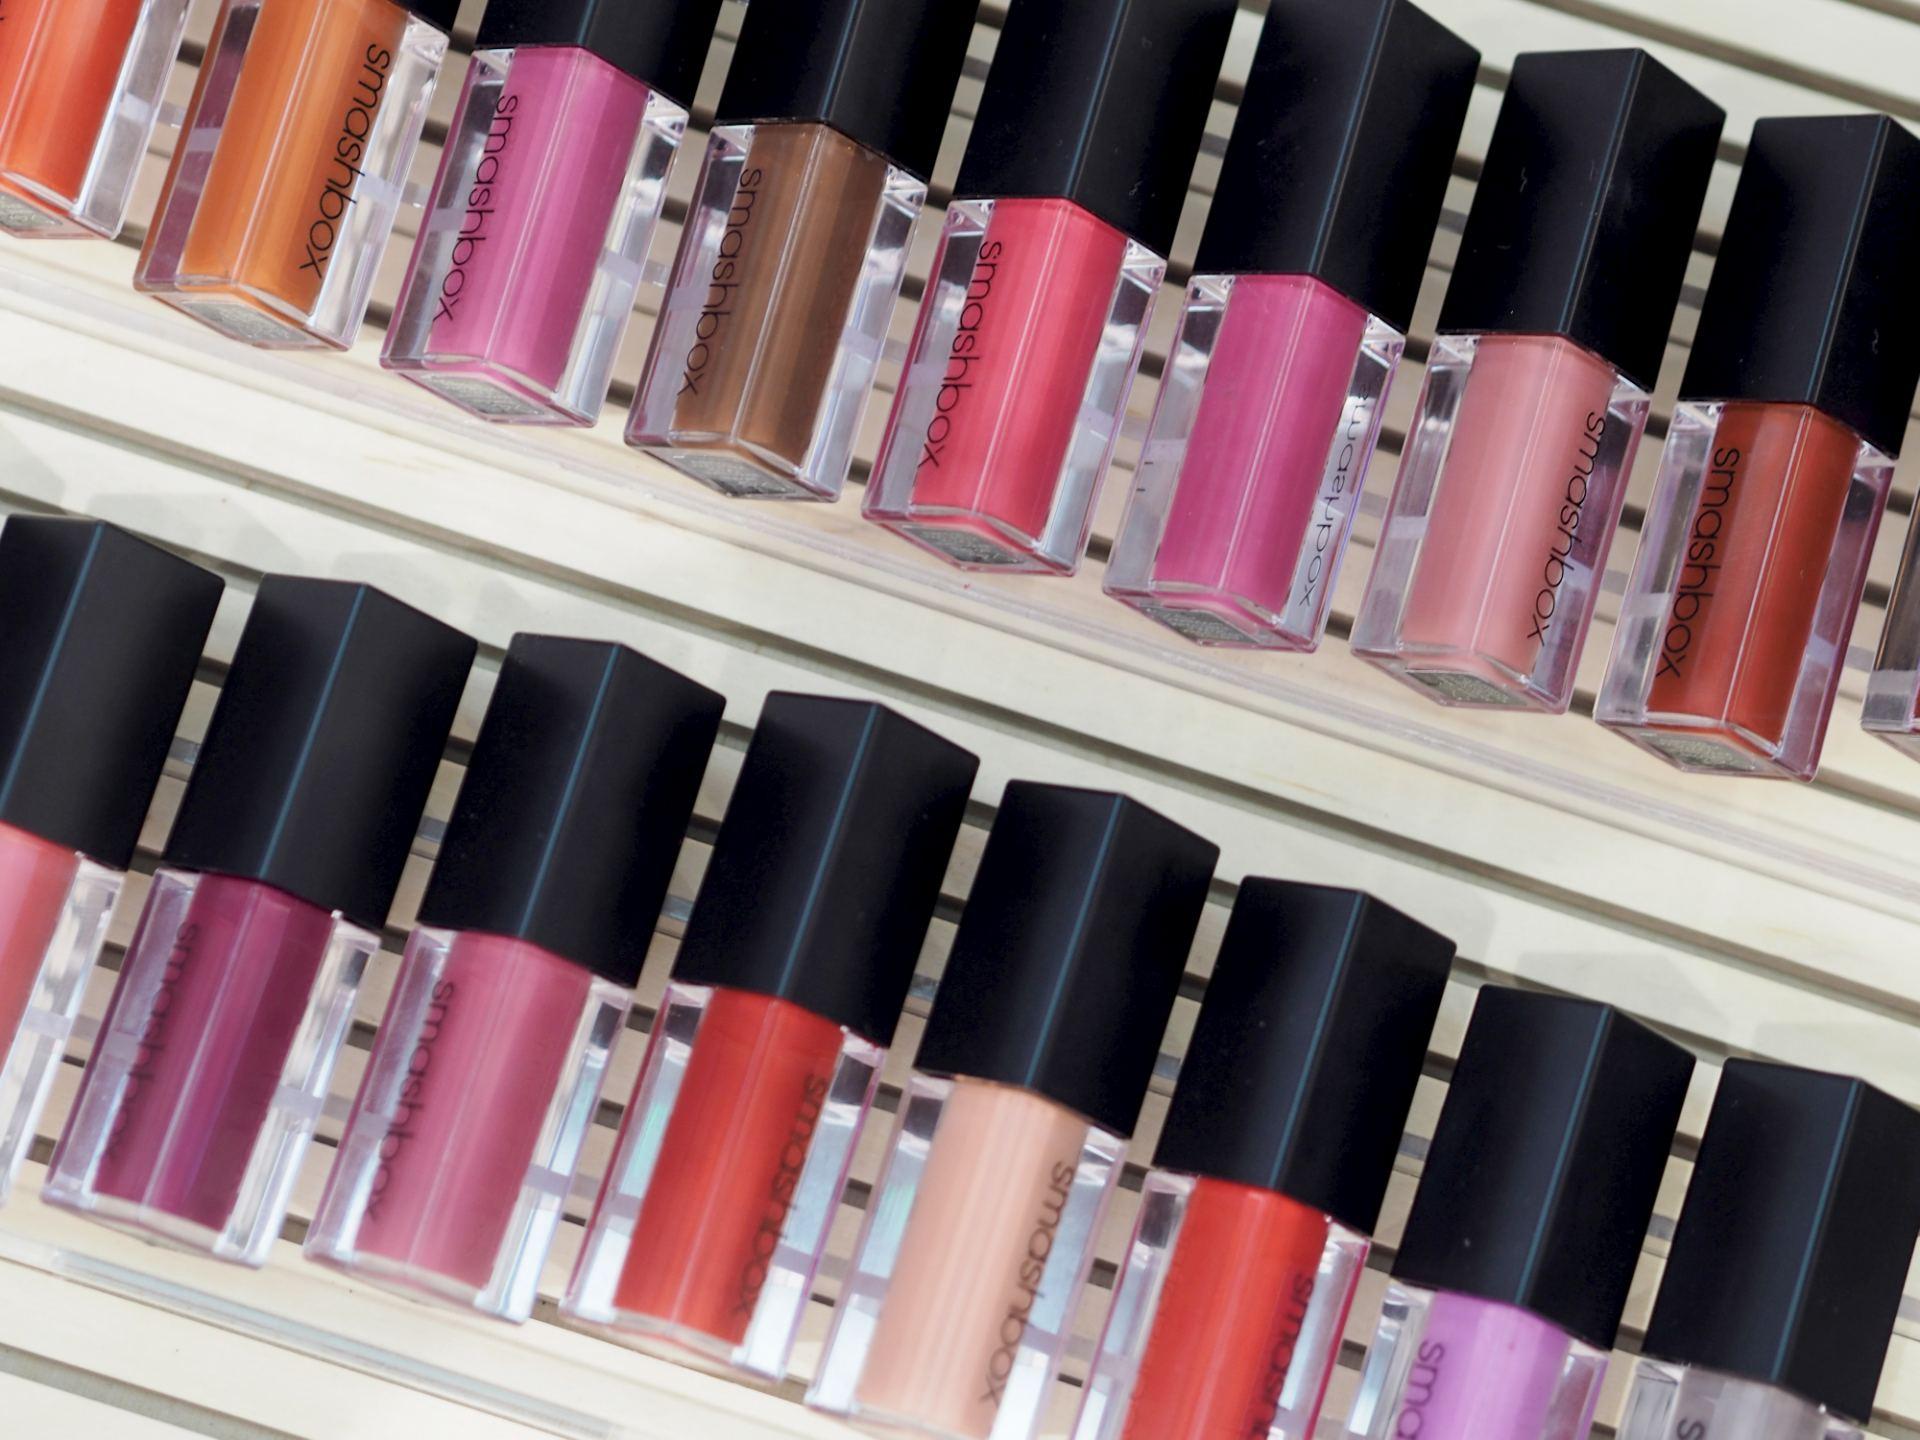 smashbox lipsticks